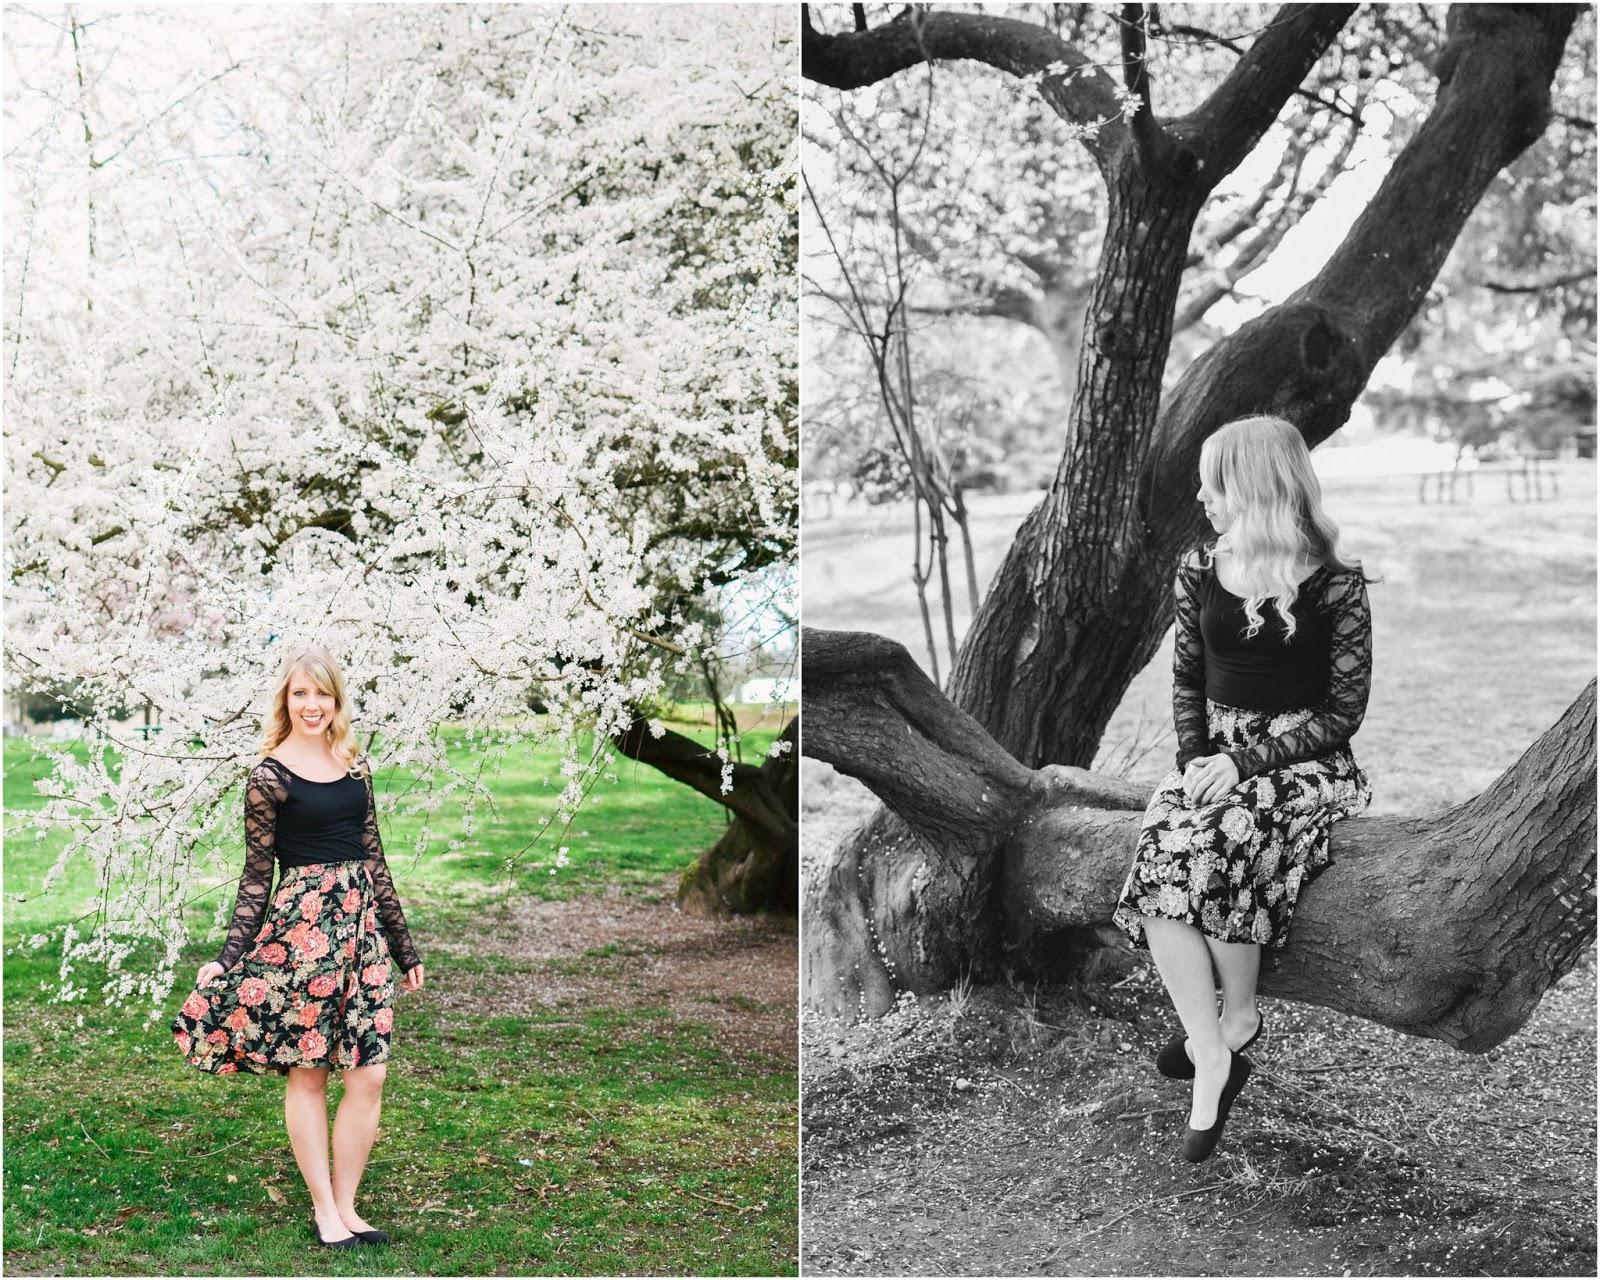 april+blossoms1-001.jpg